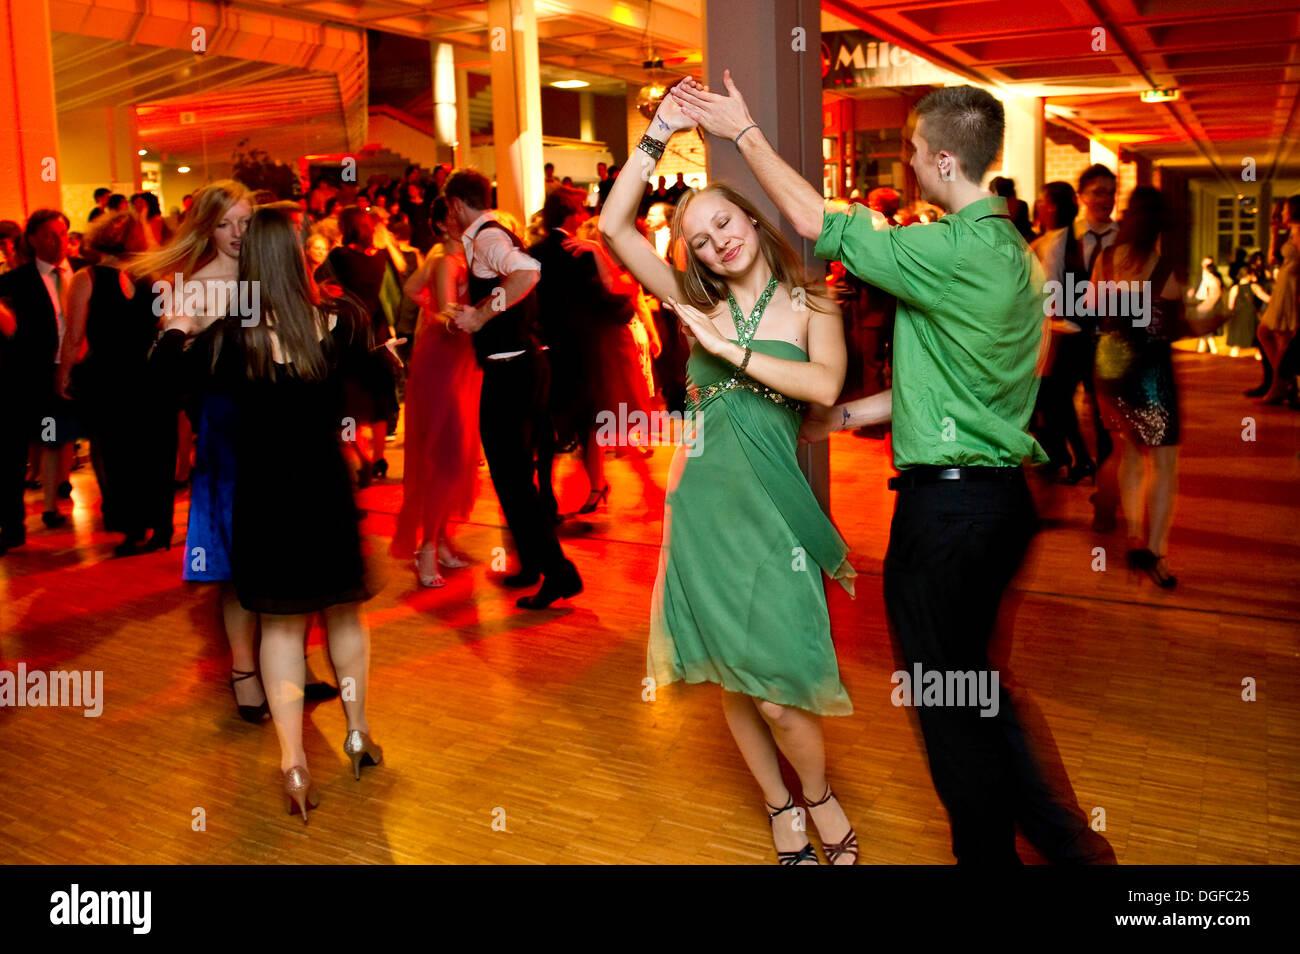 Young couple dancing at the prom d'une école de danse, Allemagne Photo Stock